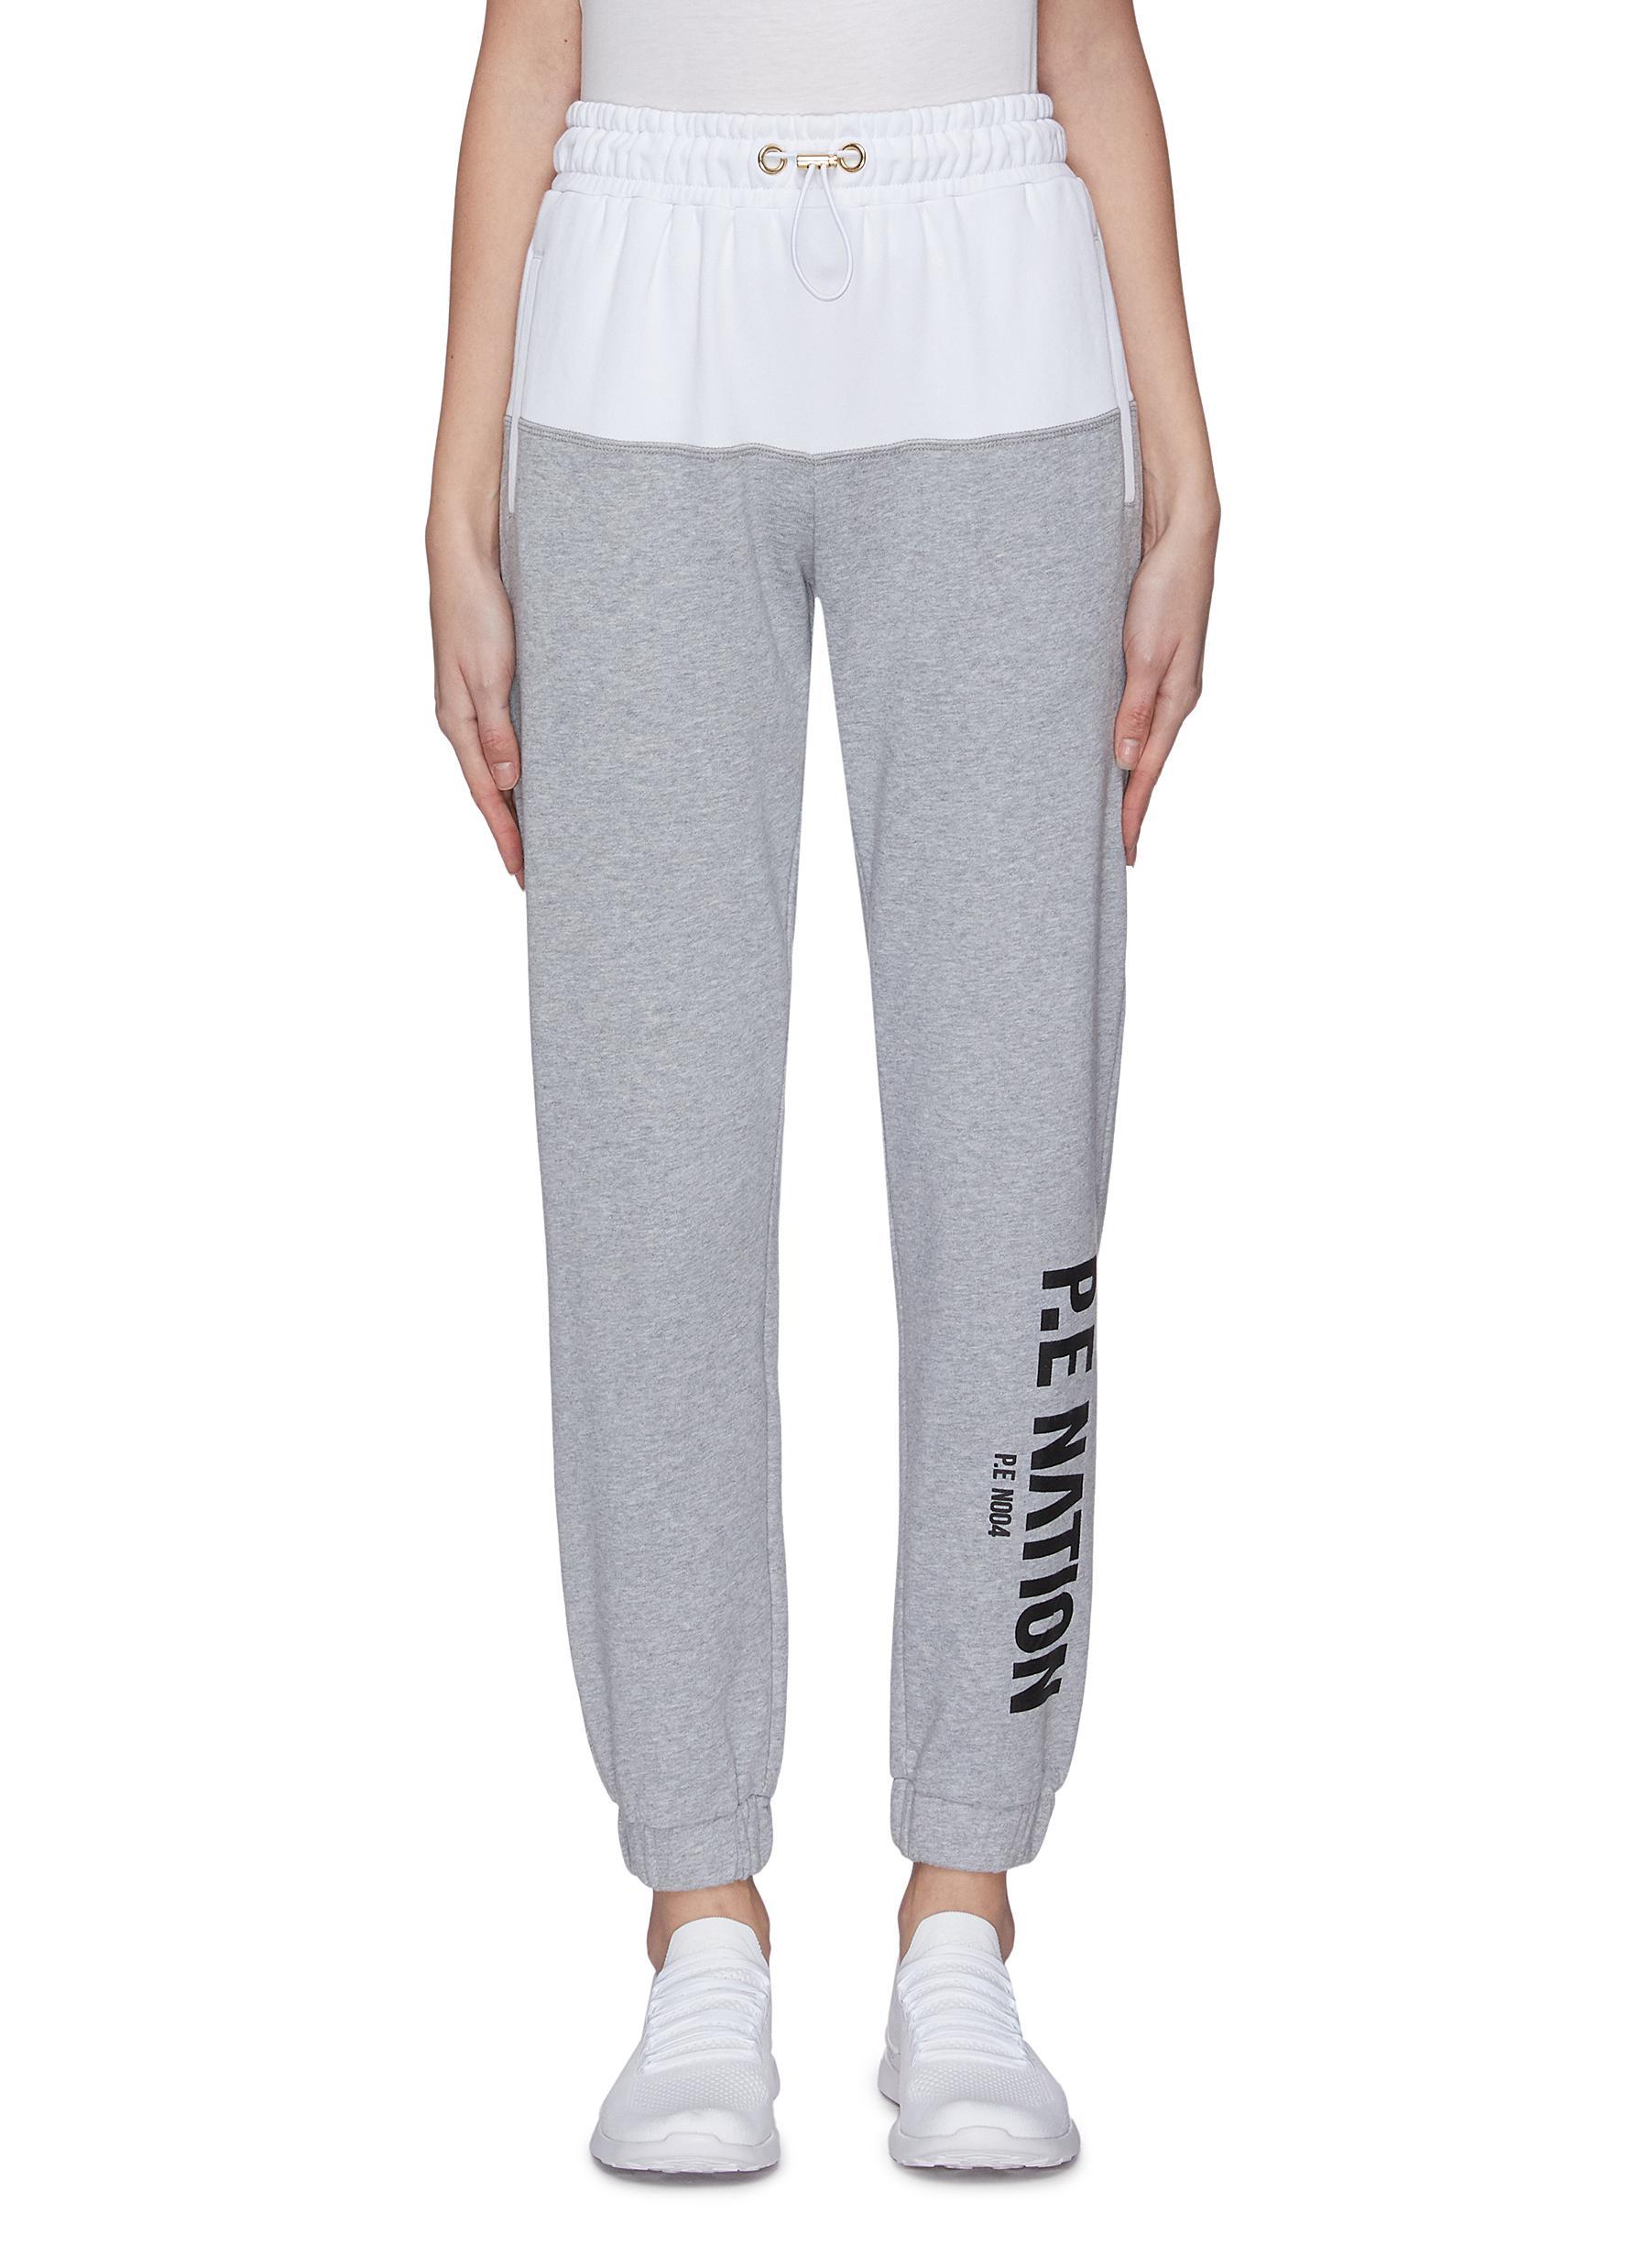 Buy P.E Nation Pants & Shorts 'Fastest lap' logo print colourblock tractpants